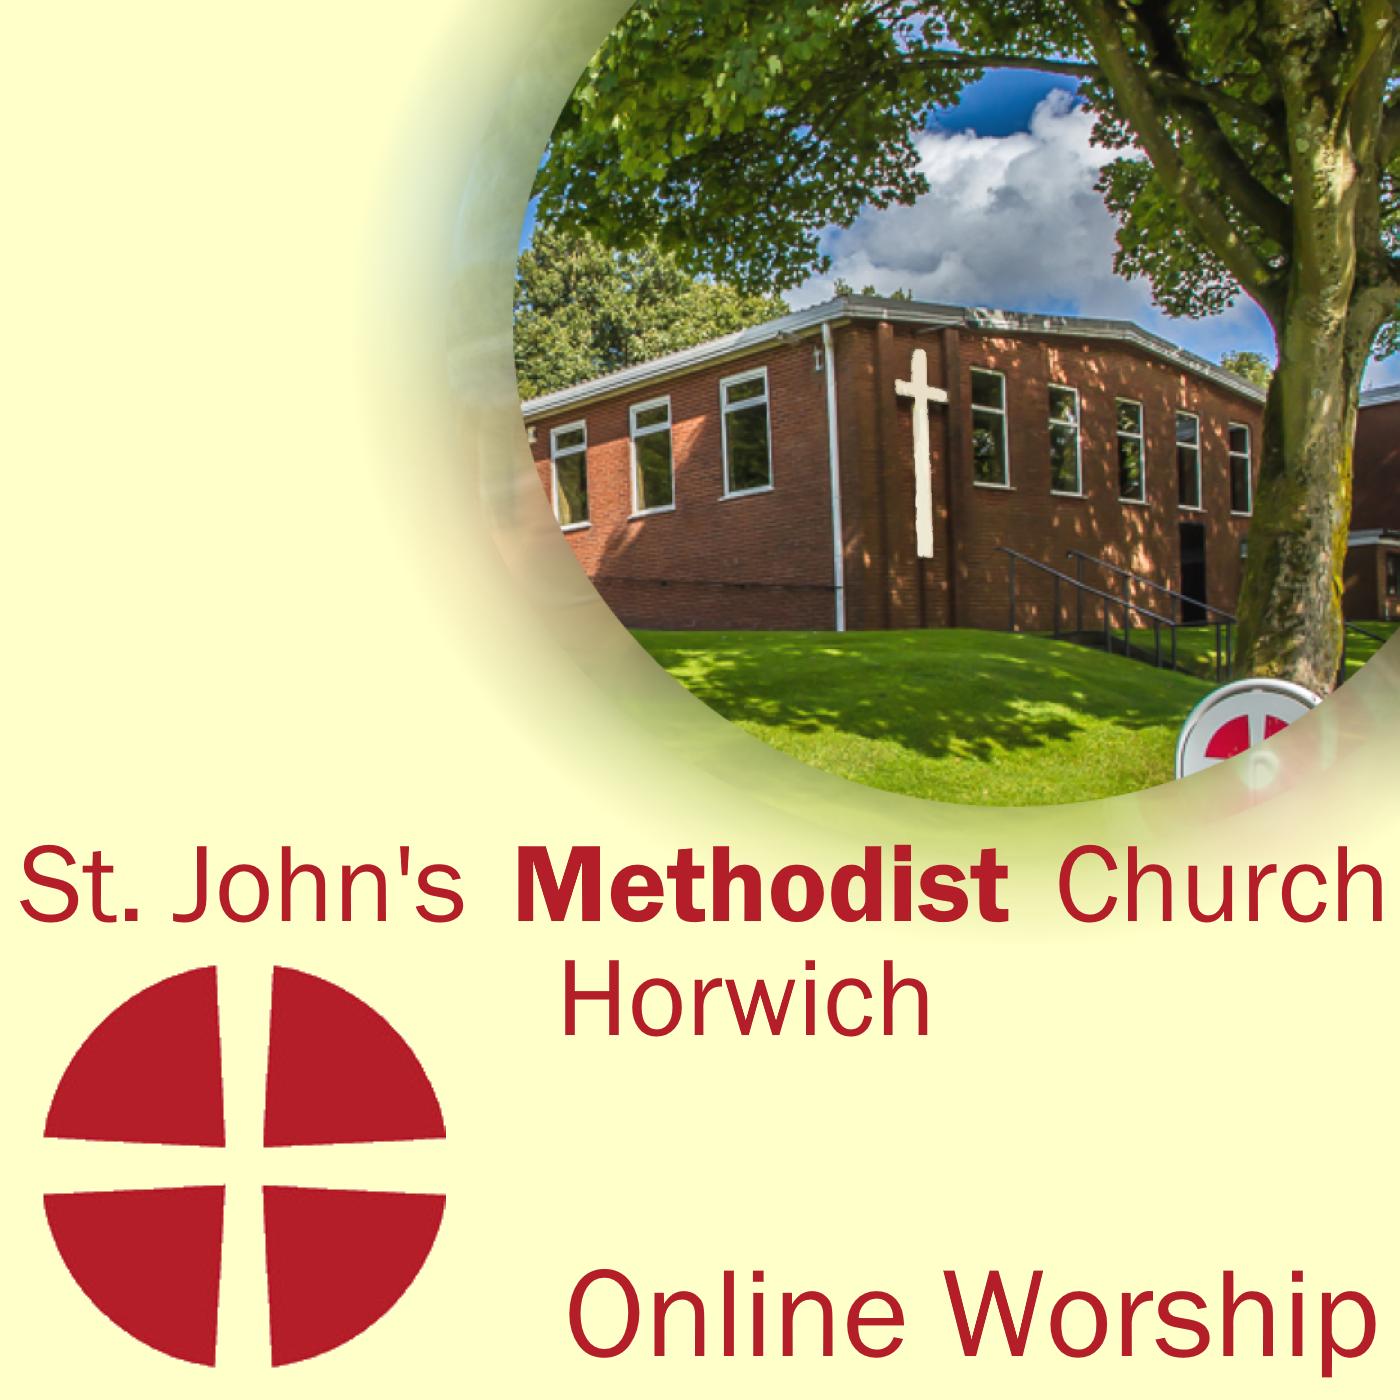 St John's Methodist Church Horwich Online Worship